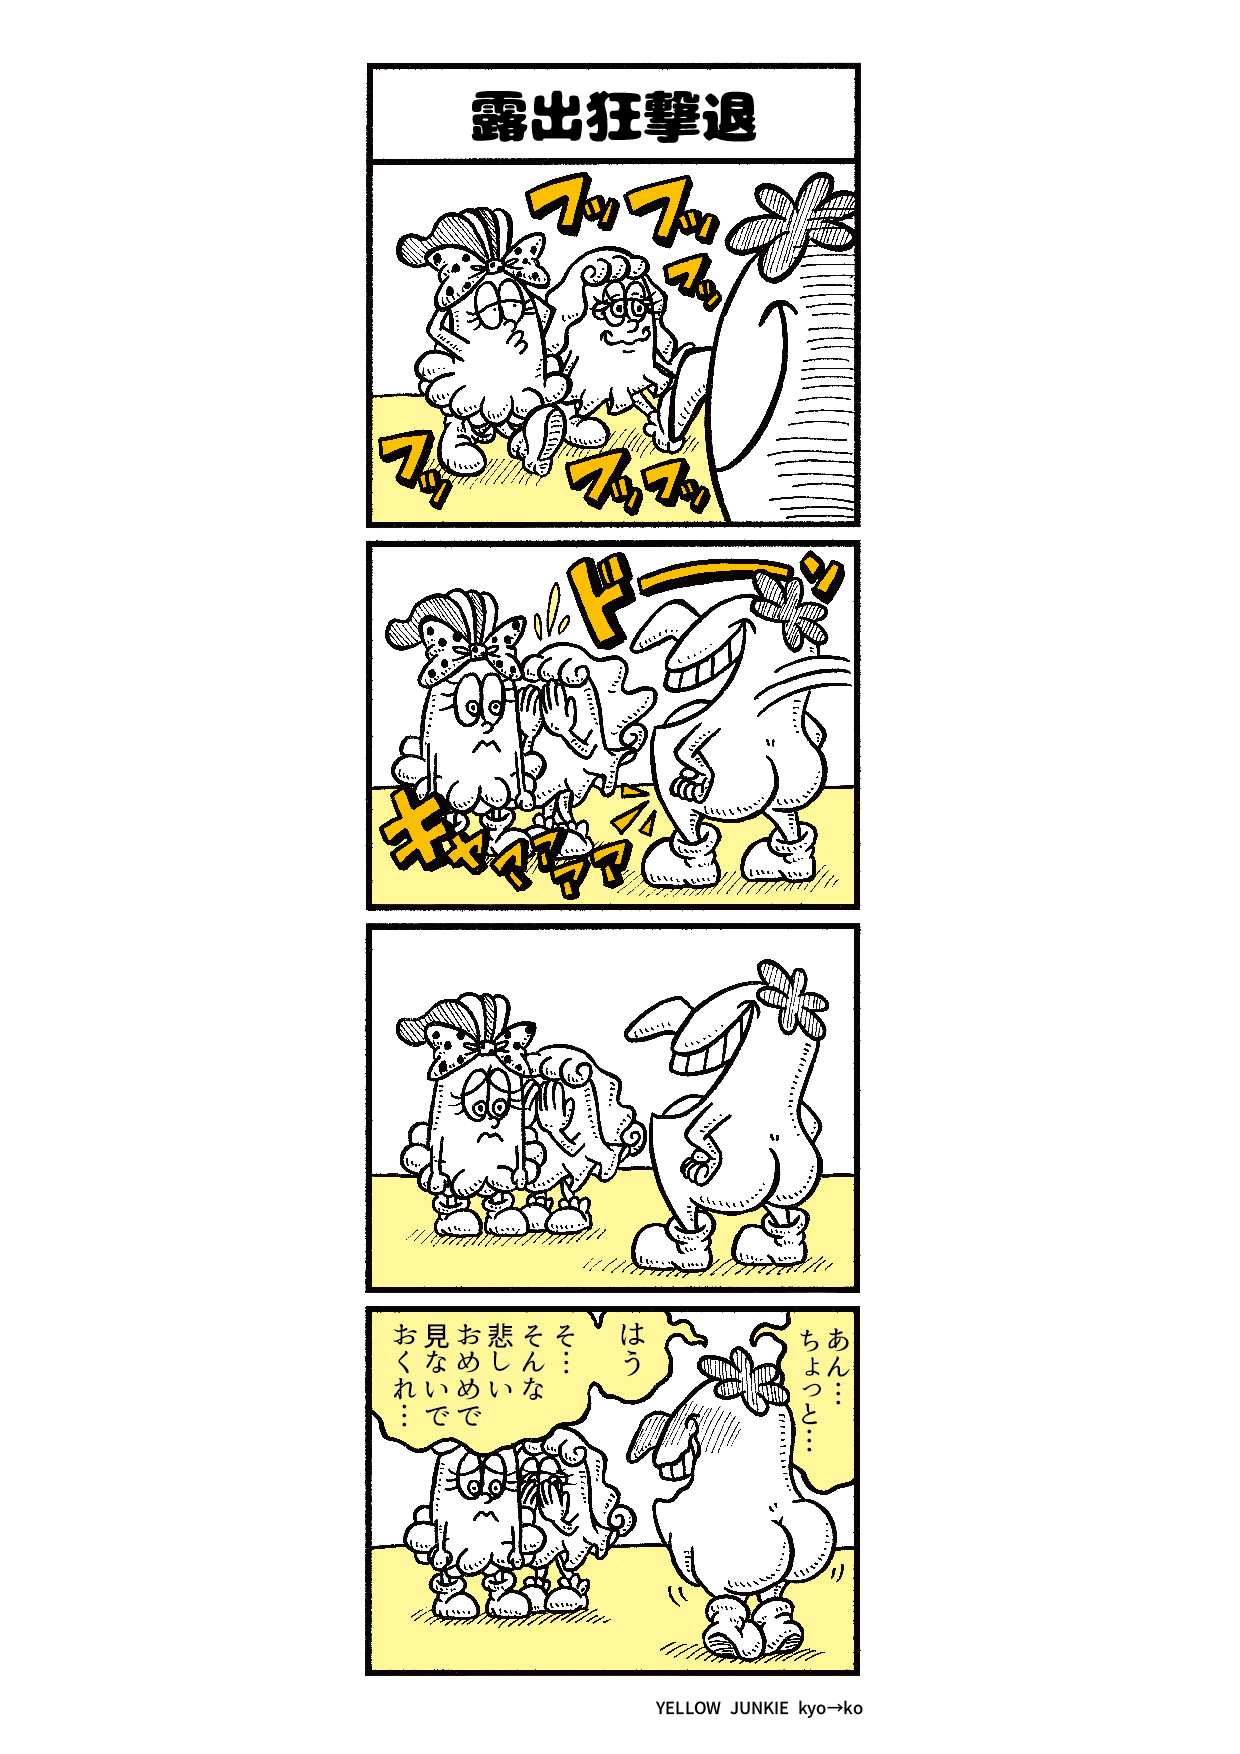 YELLOW JUNKIE「27話:露出狂撃退」